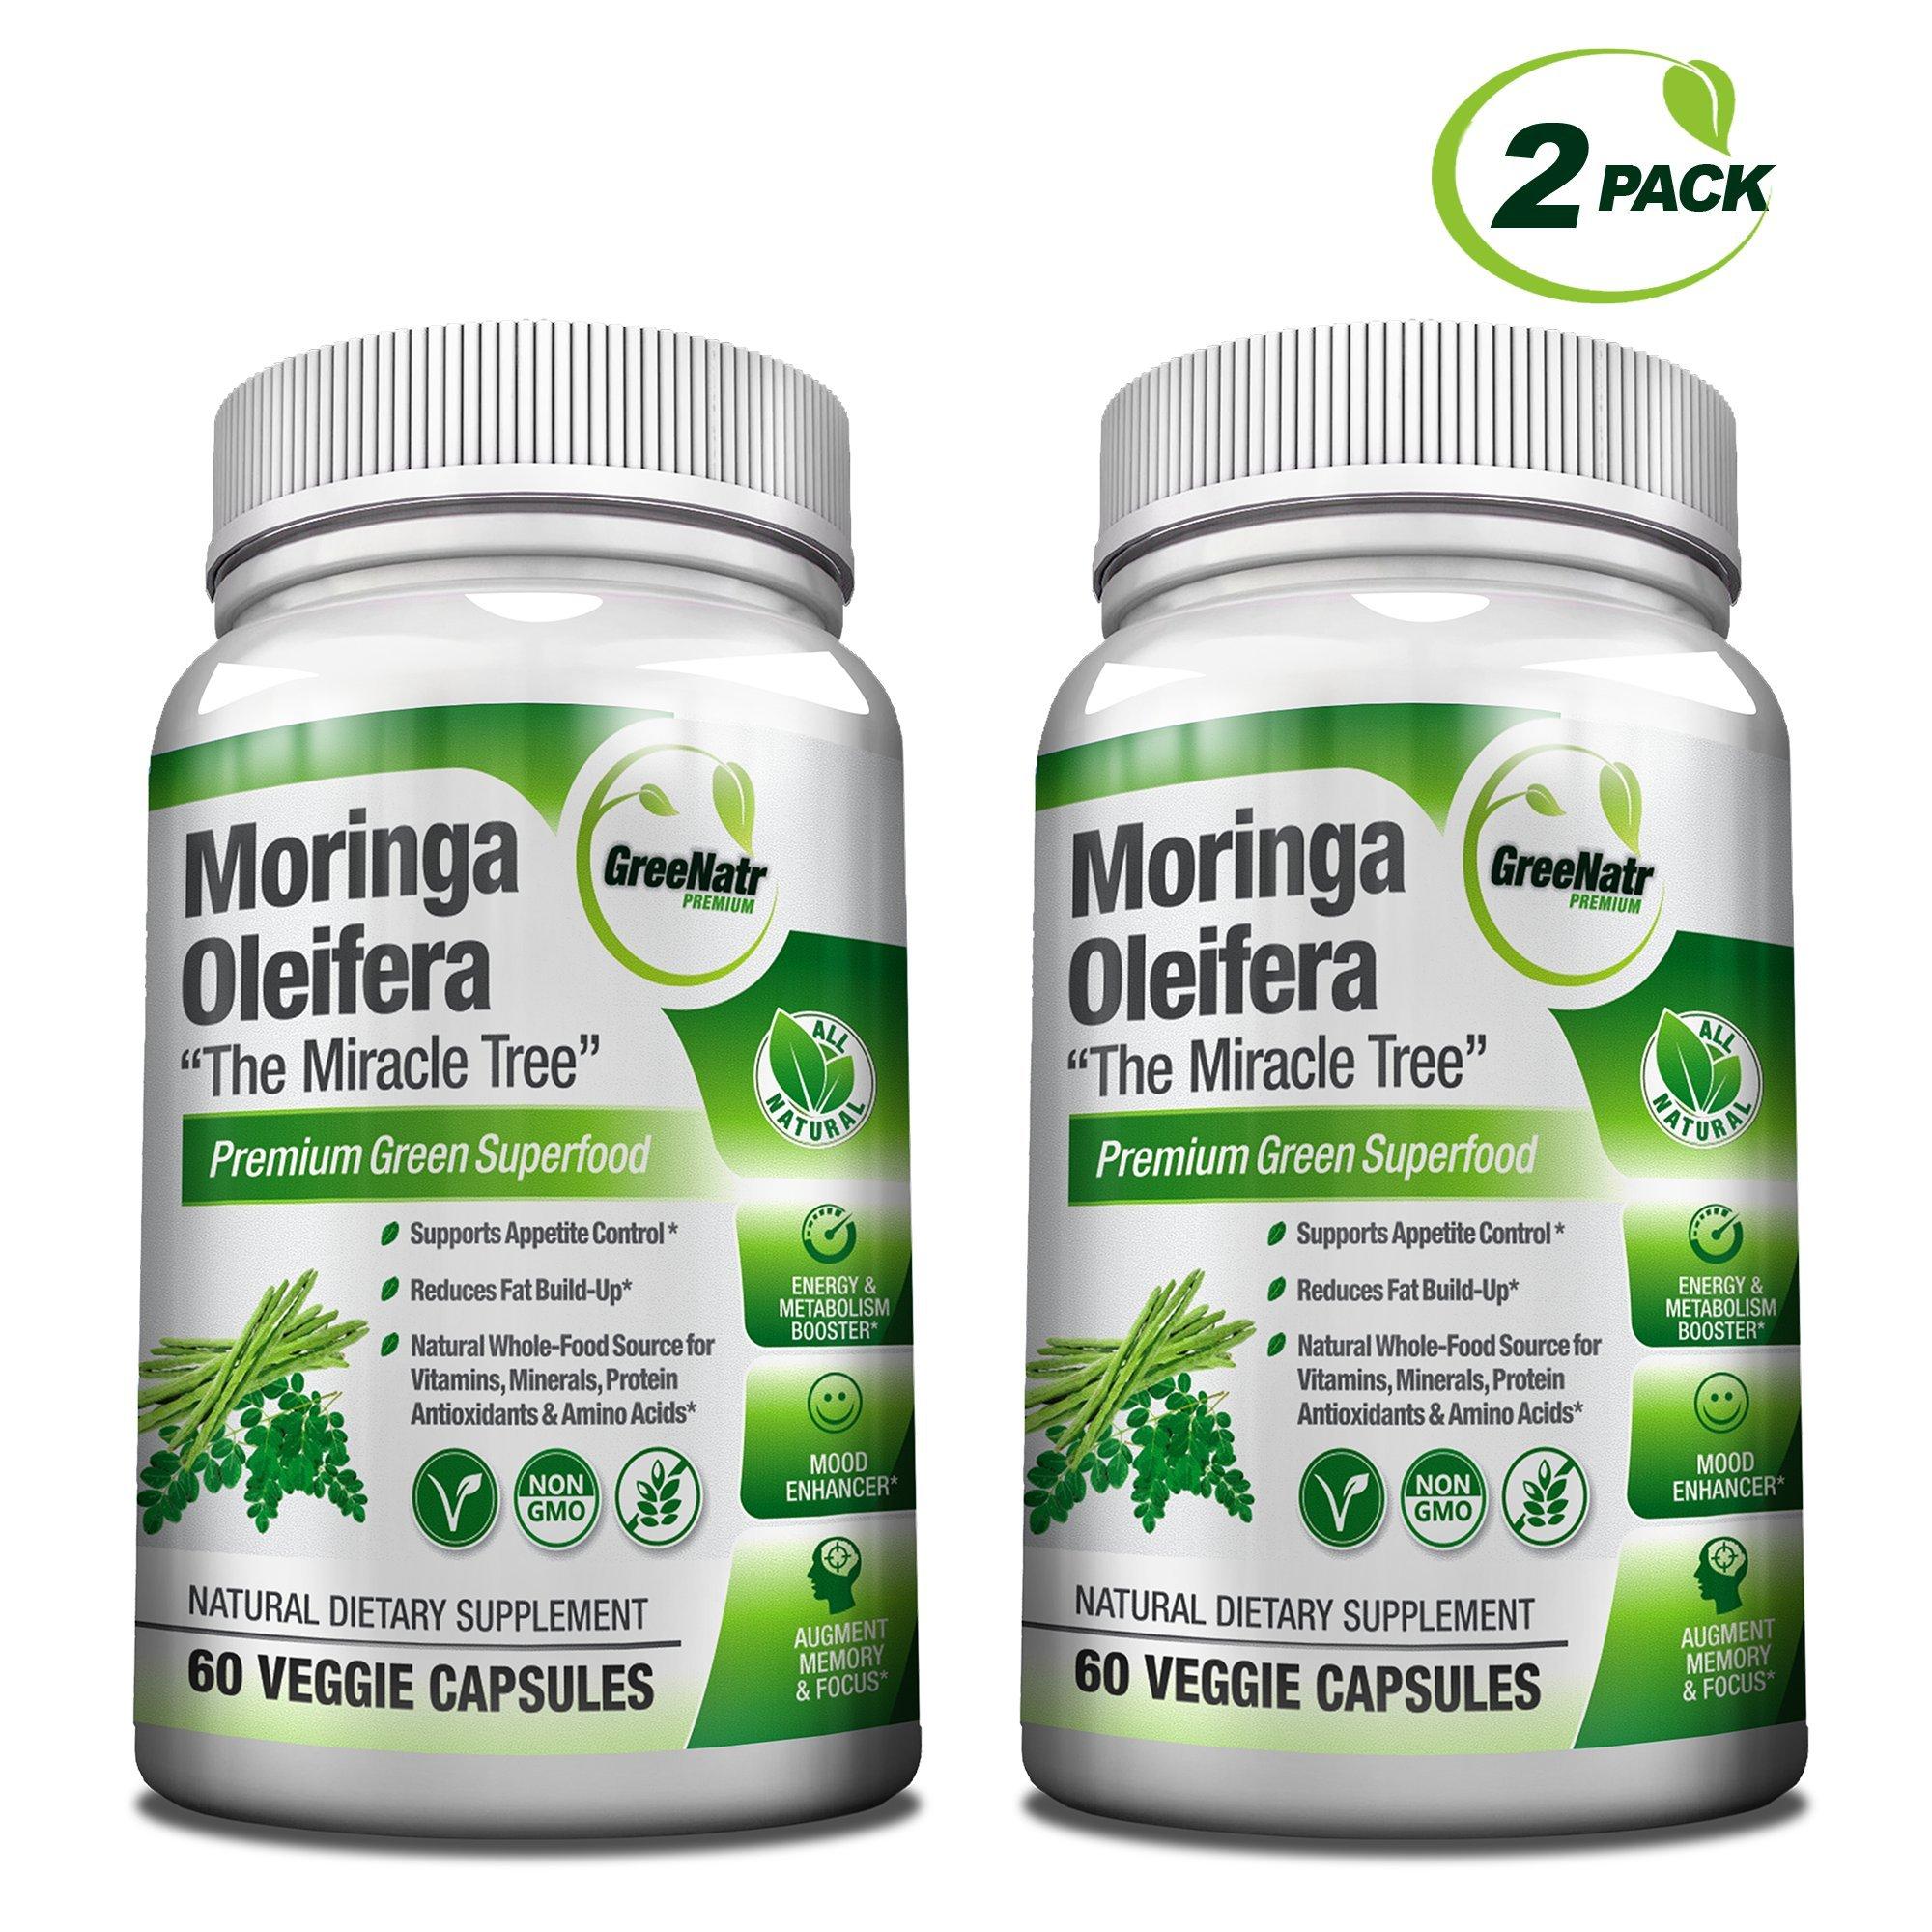 GreeNatr Moringa Oleifera Leaf Extract - Mood, Memory and Focus Enhancer - 120 Veggie Capsules / Gluten Free (2 Bottles)